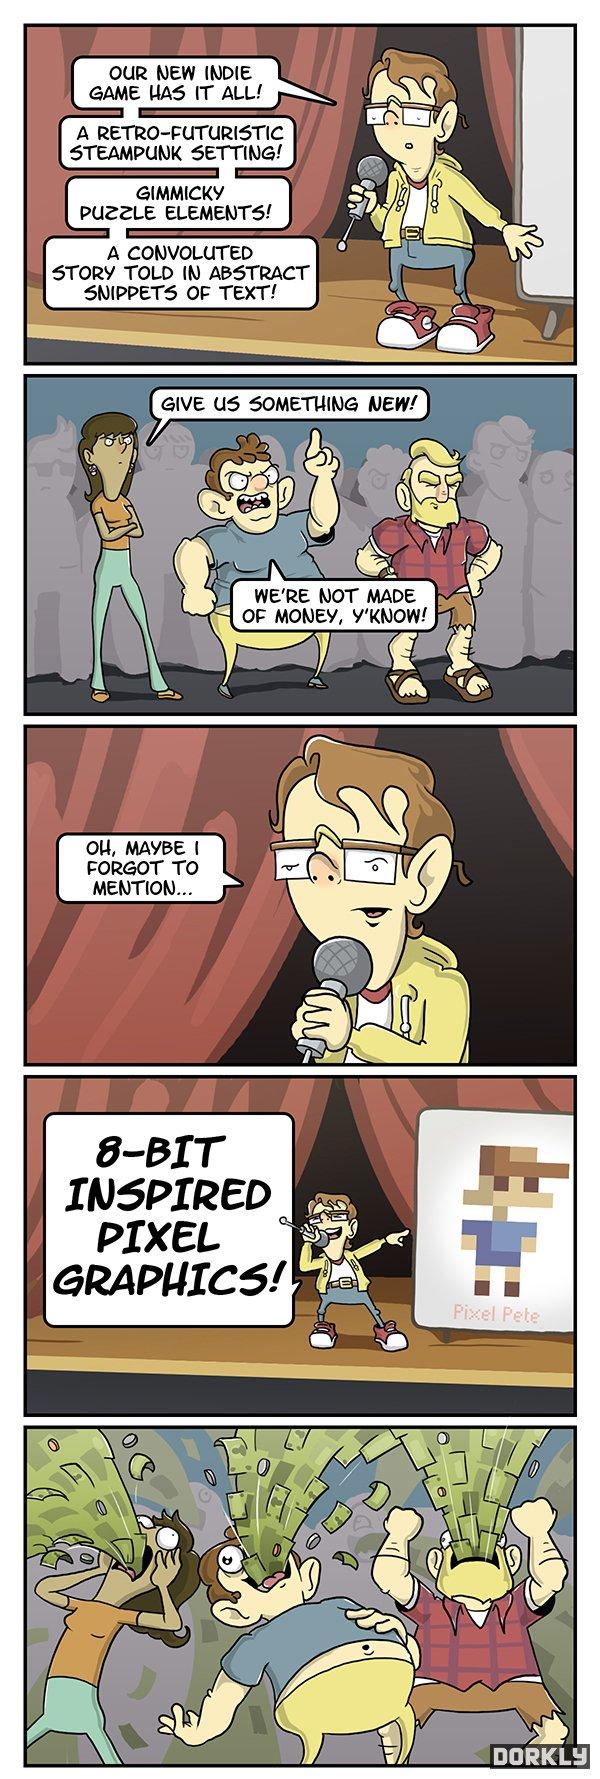 indie game annoucement